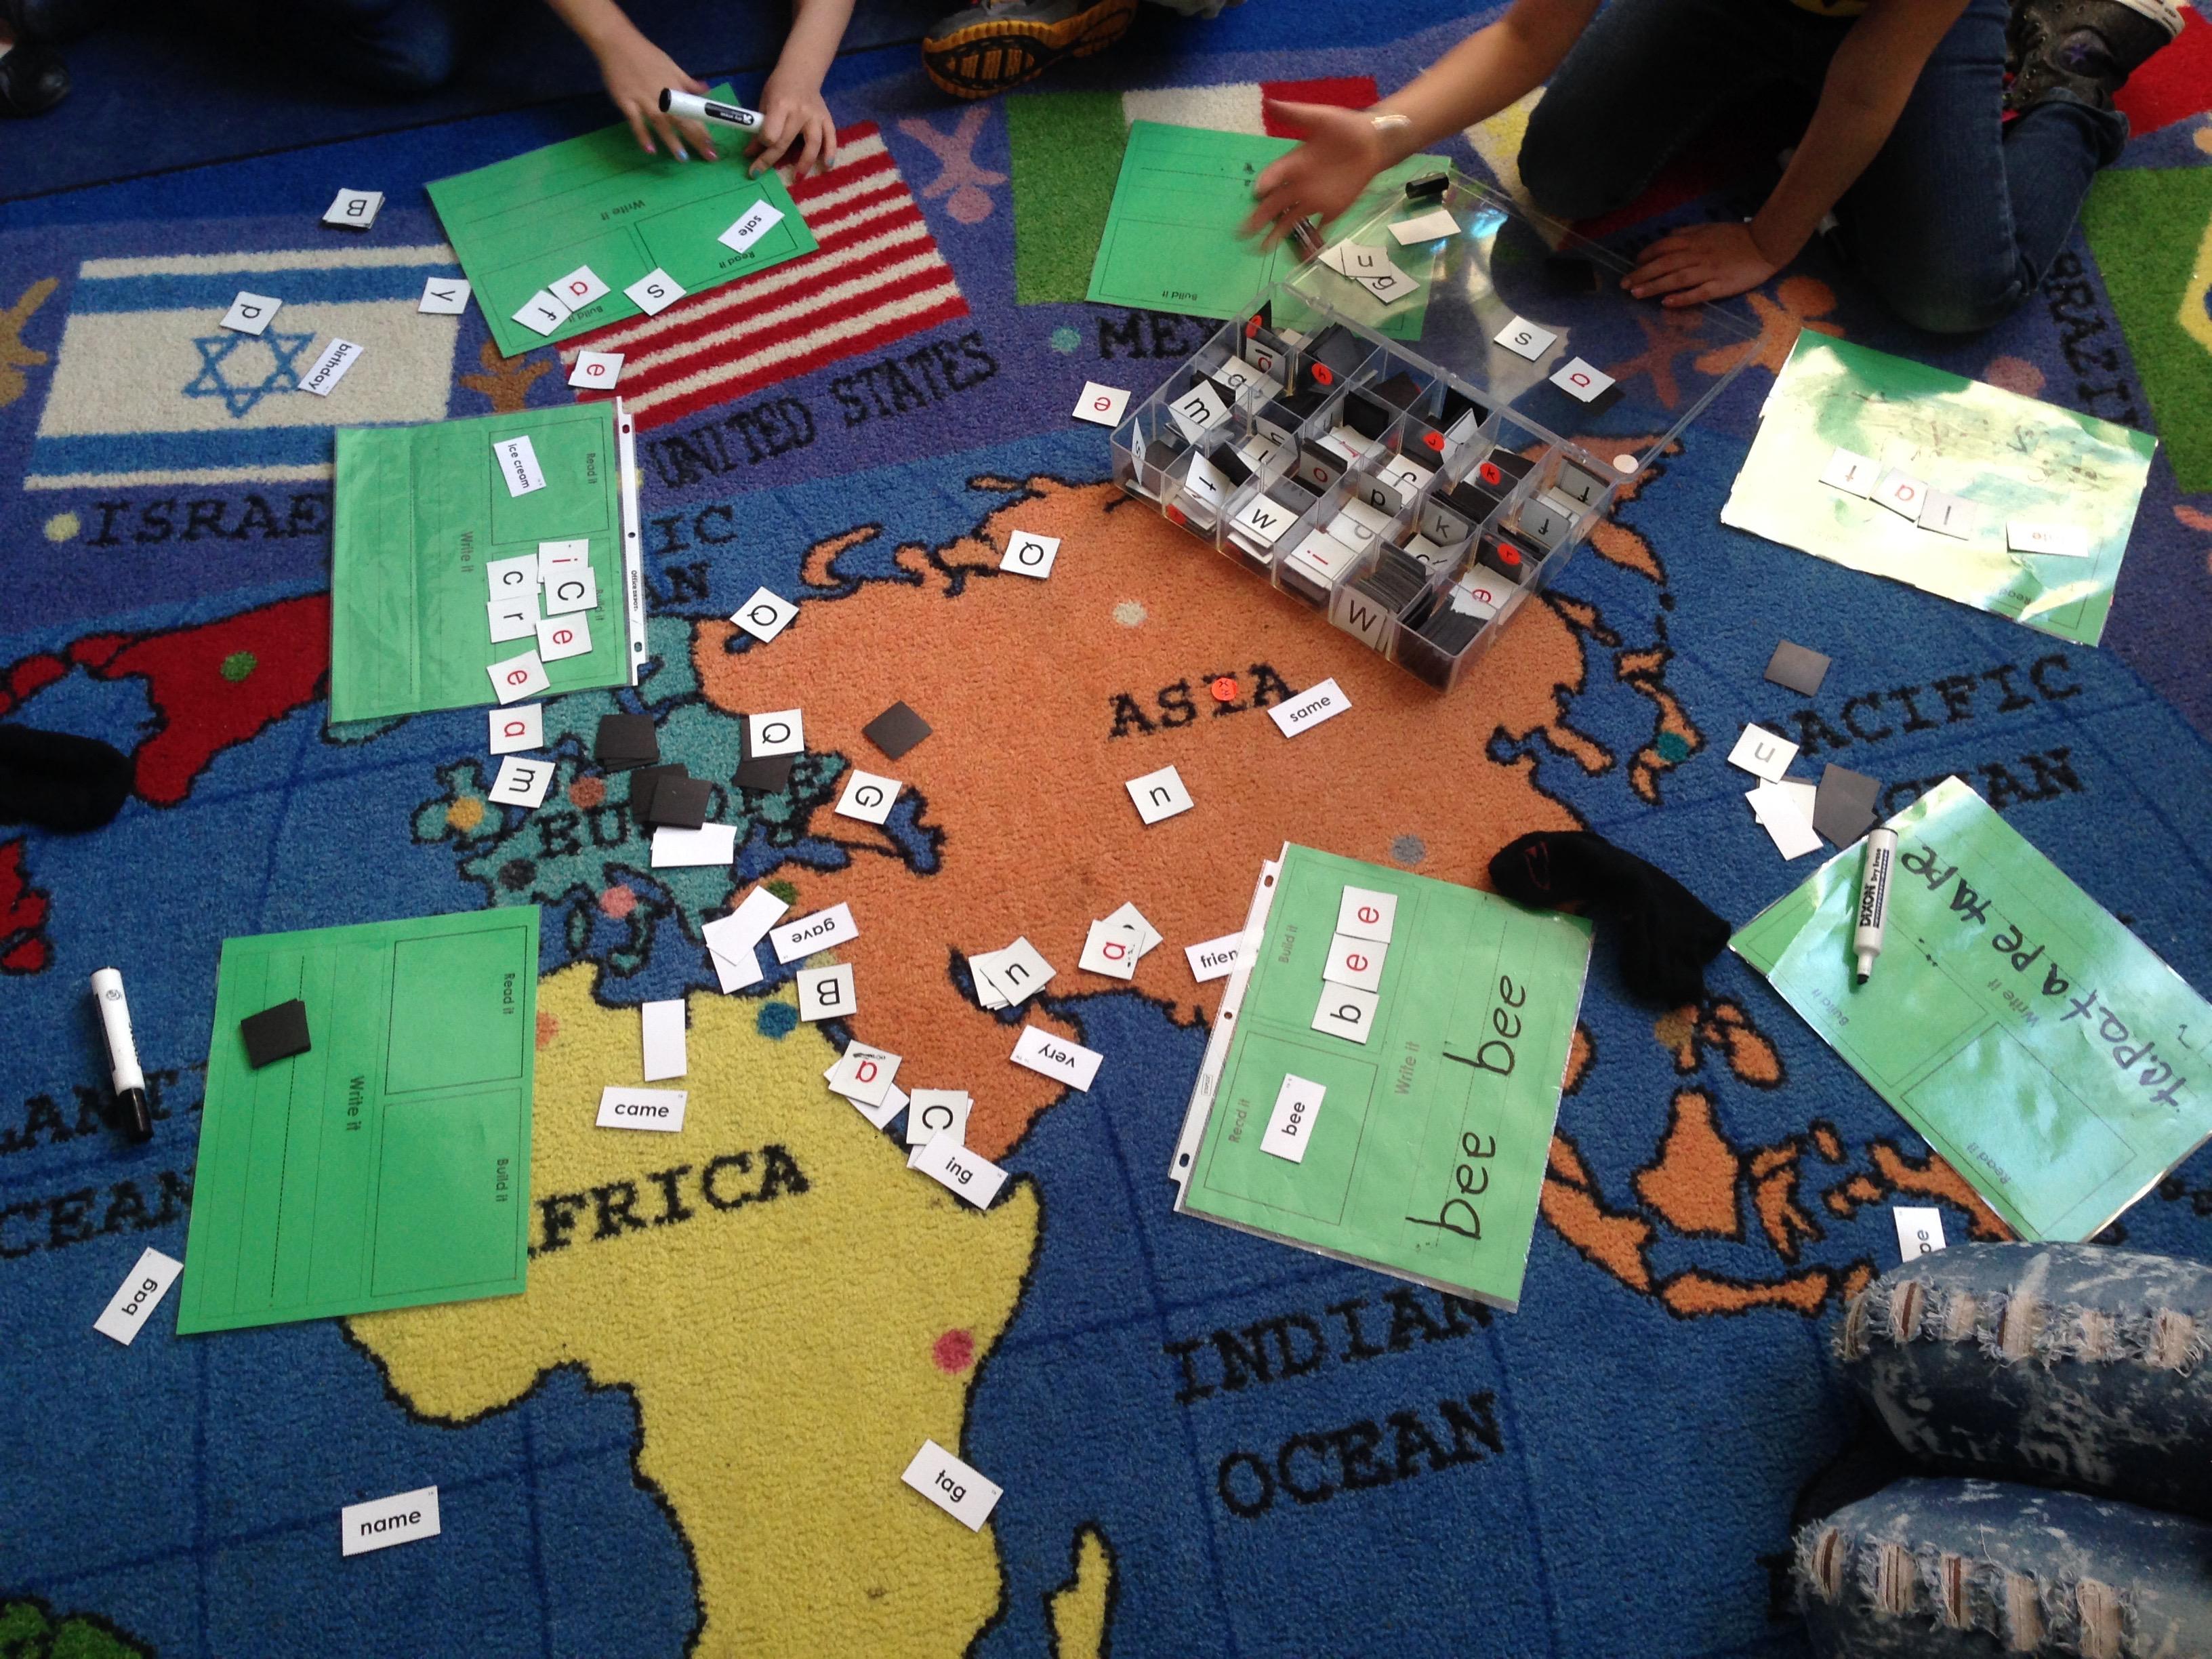 a7dc27127a Wiley International Studies Magnet Elementary School   Homepage